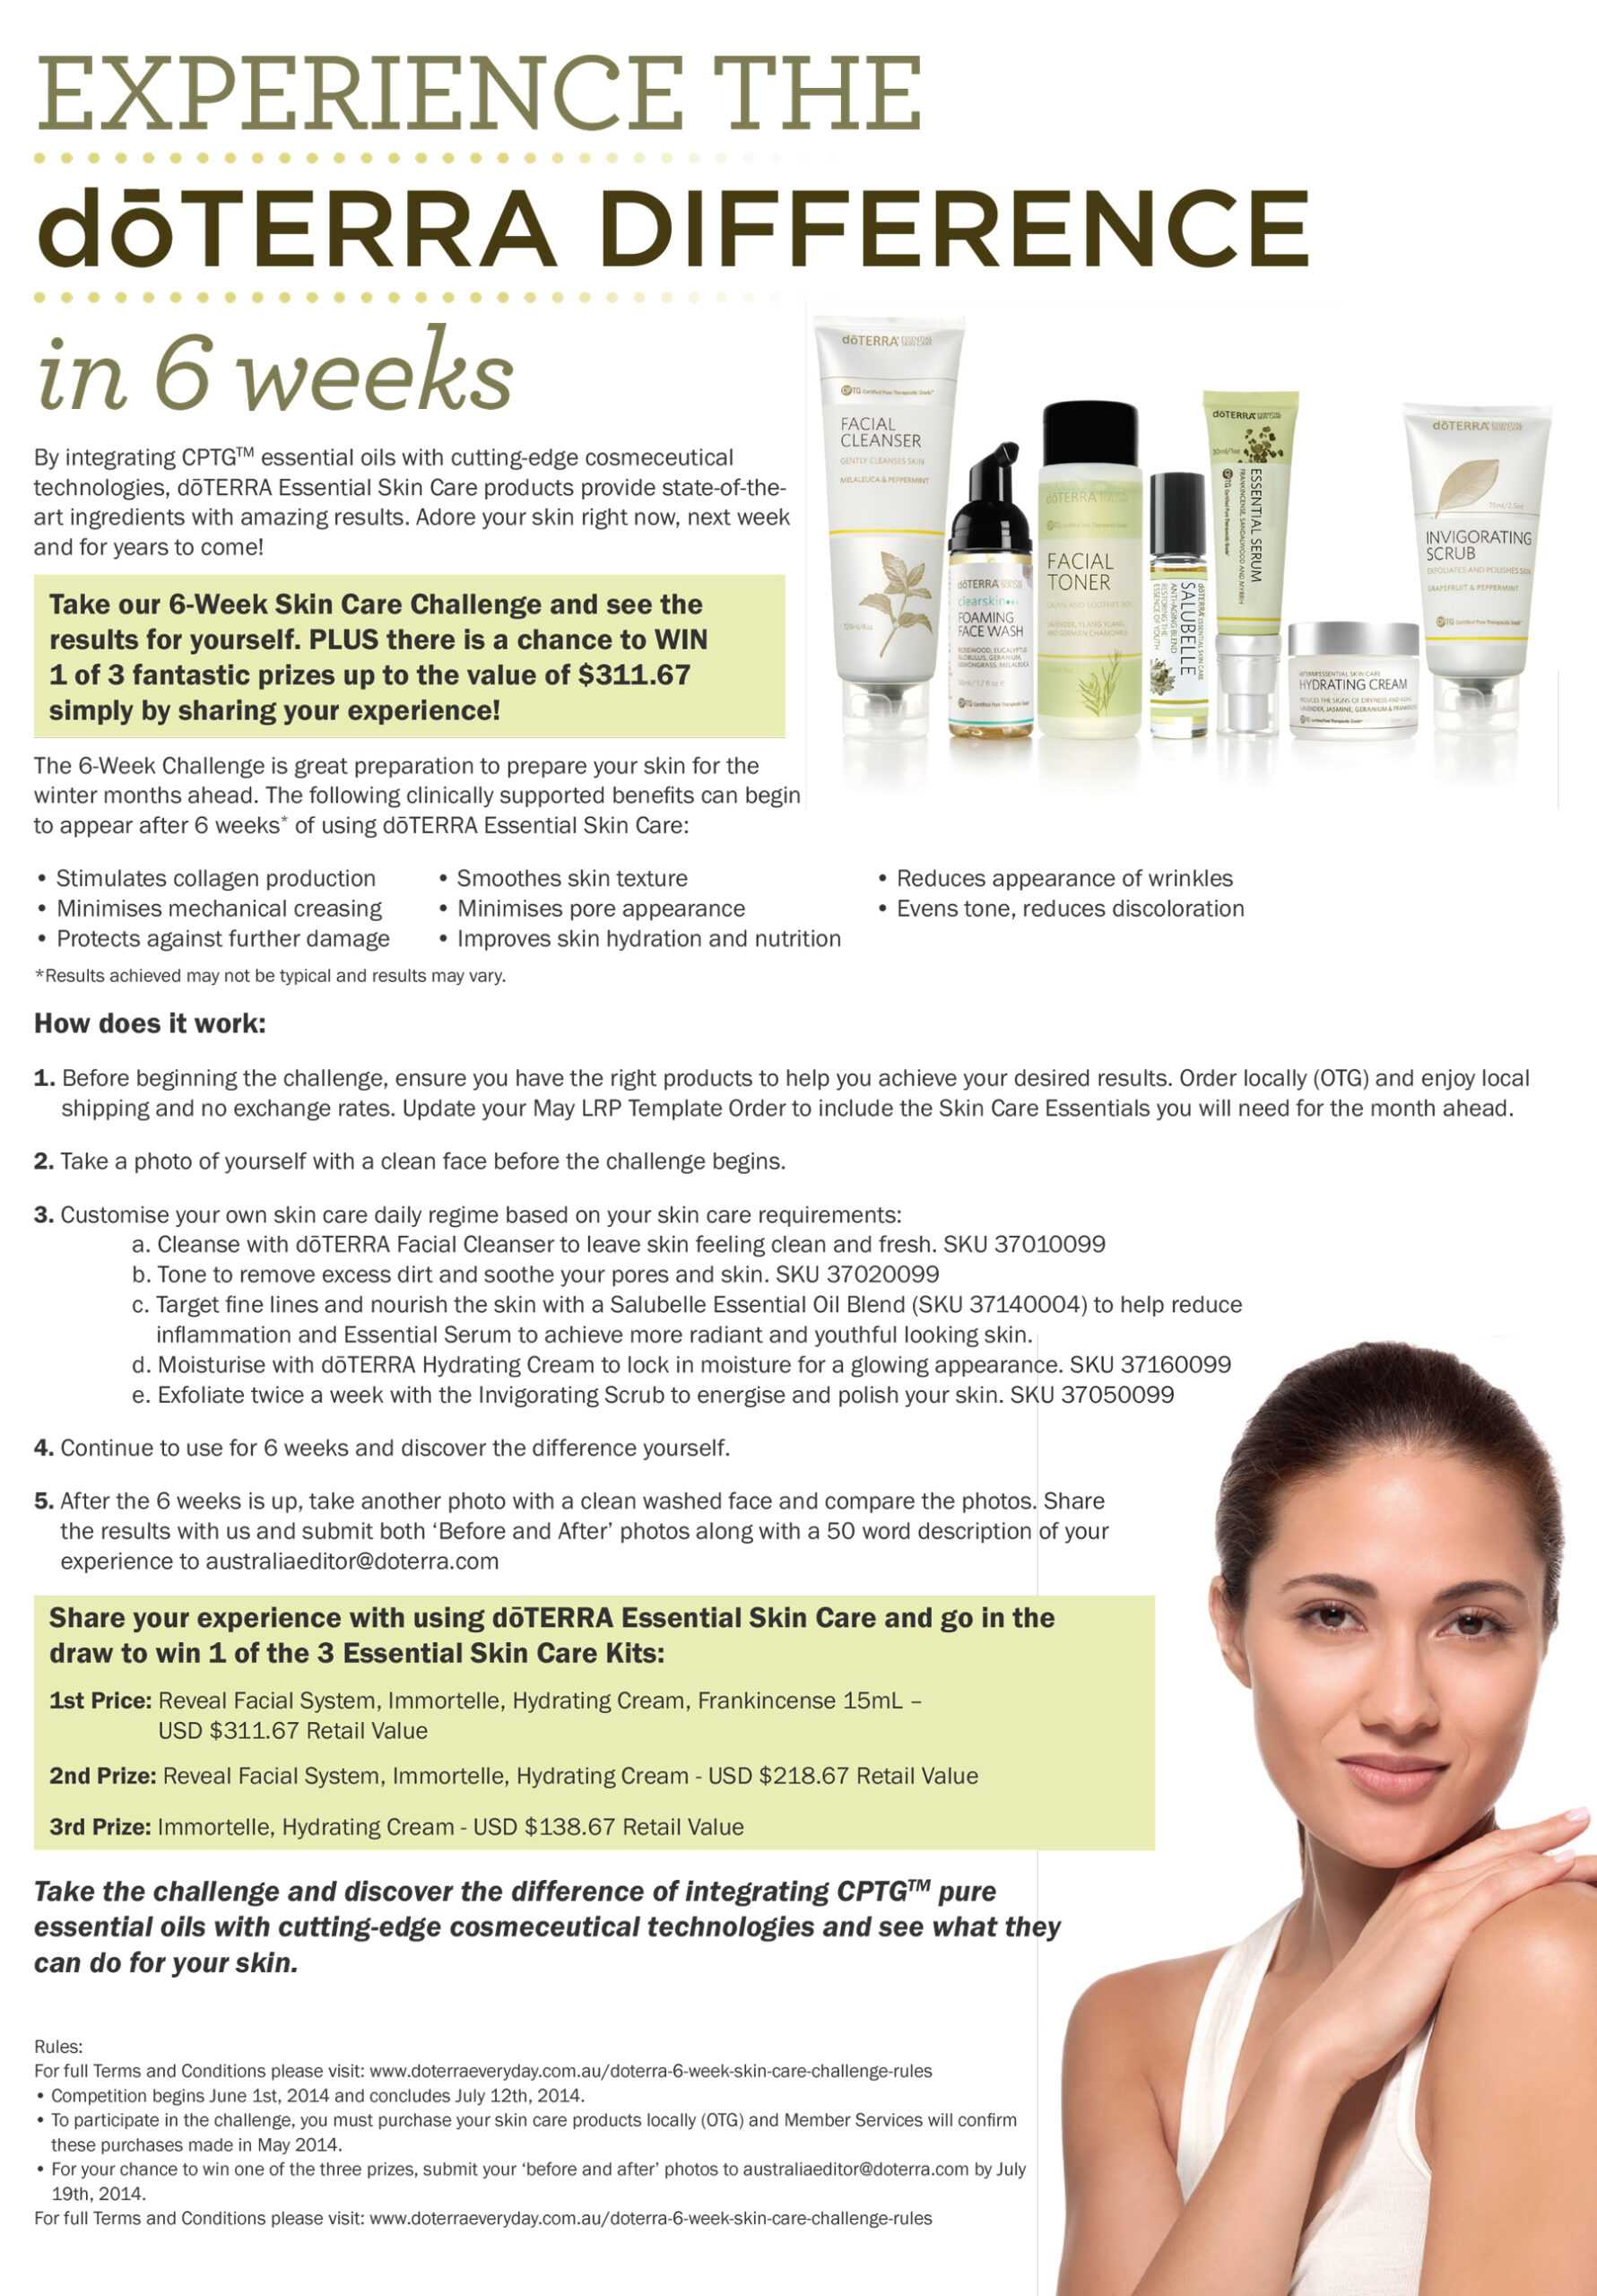 Dōterra 6 Week Skin Care Challenge - Rules - Dōterra In Doterra Flyer Templates